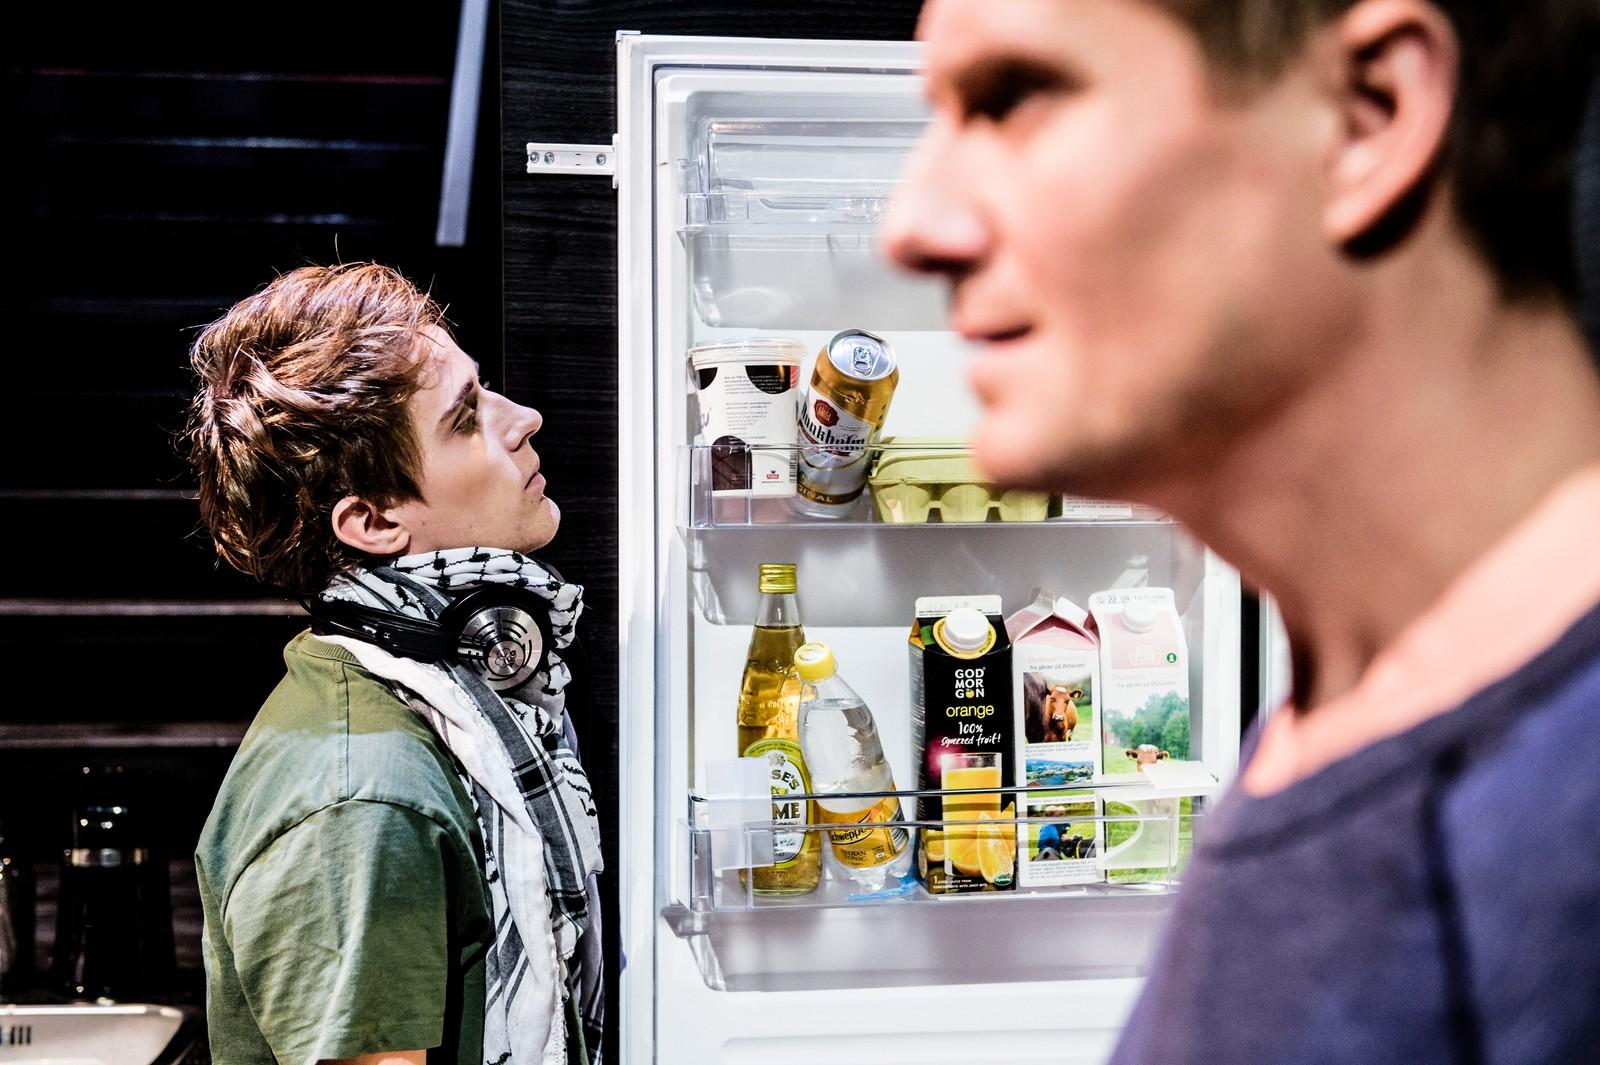 KNUTE PÅ TRÅDEN: Bjørn (Frode Winther) sliter med å holde samtalen i gang med sønnen Odin (Axel Gehrken Bøyum).